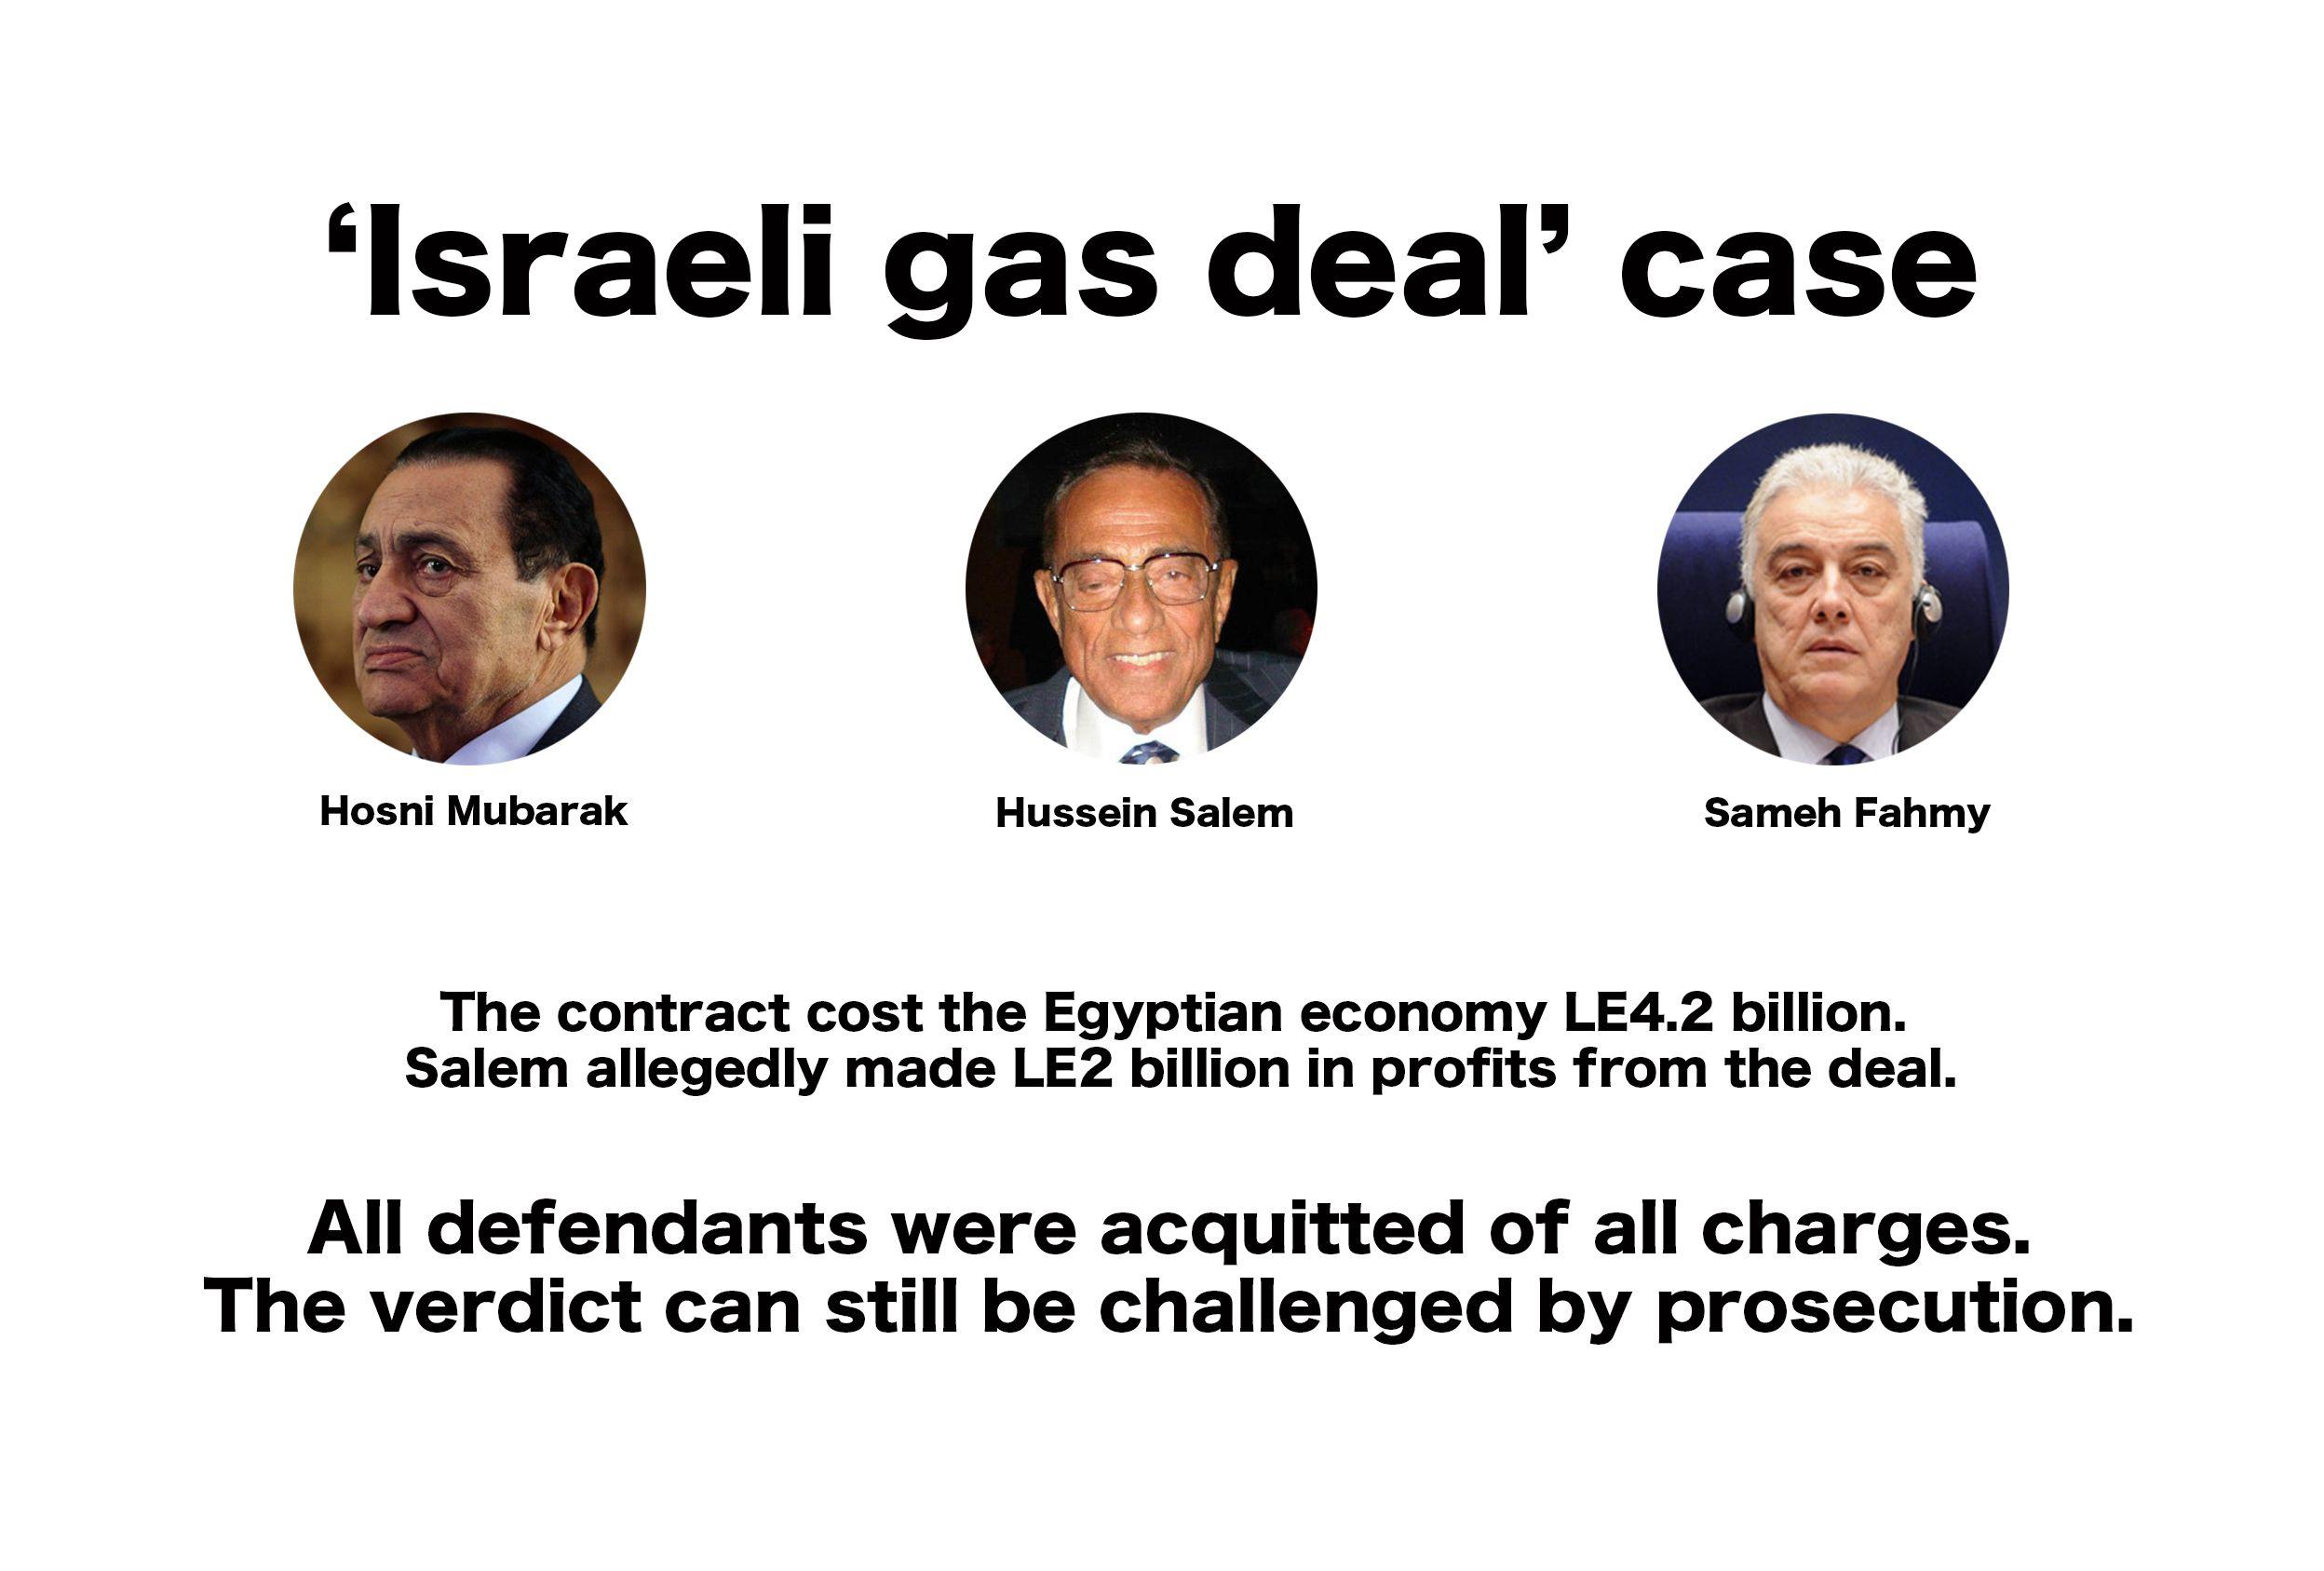 Israeli gas deal